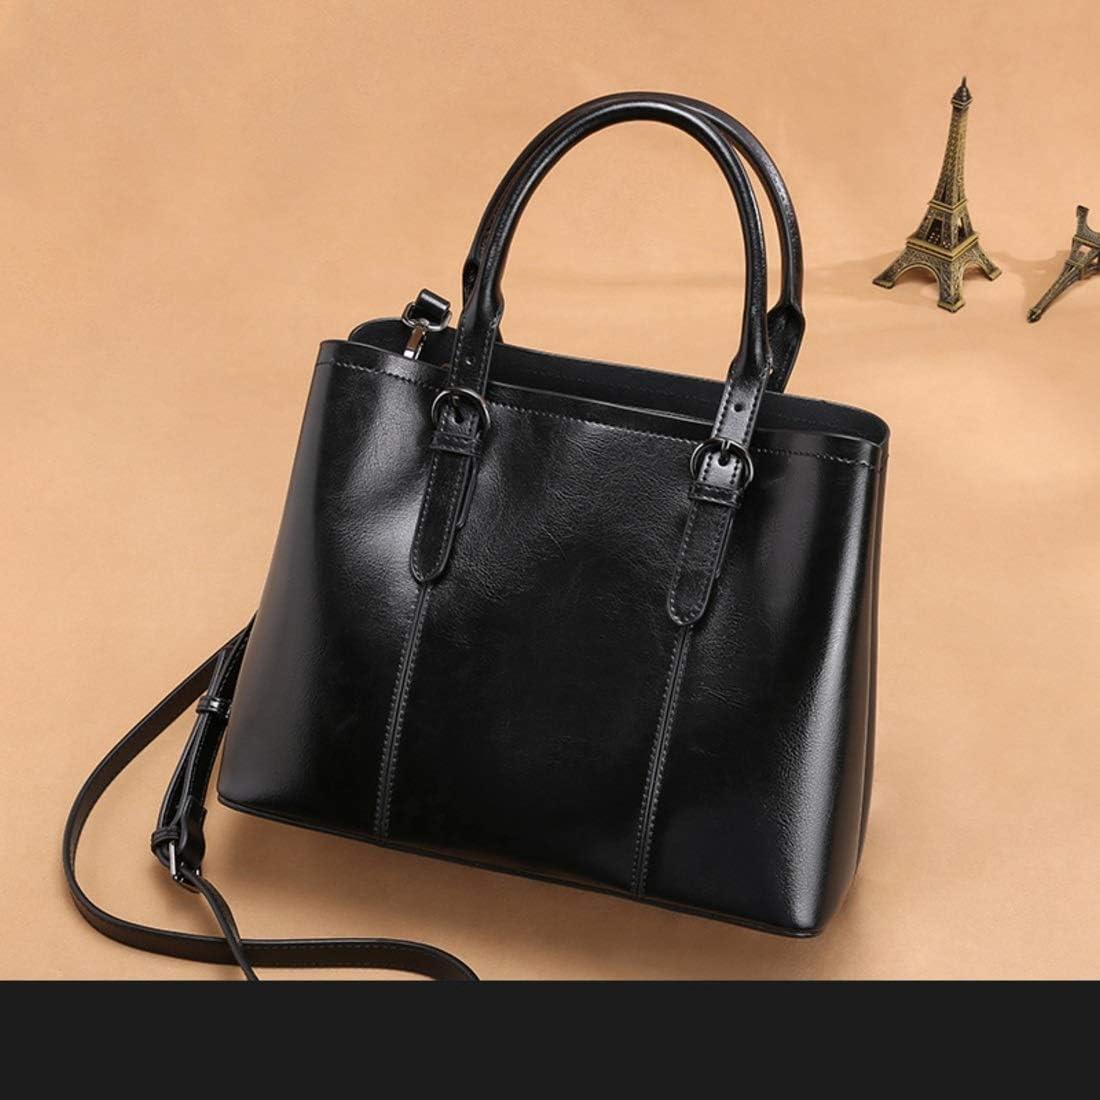 GSAYDNEE Damen Satchel Top Griff Tote aus echtem Leder Handtasche Schultertasche (Color : Brown) Black